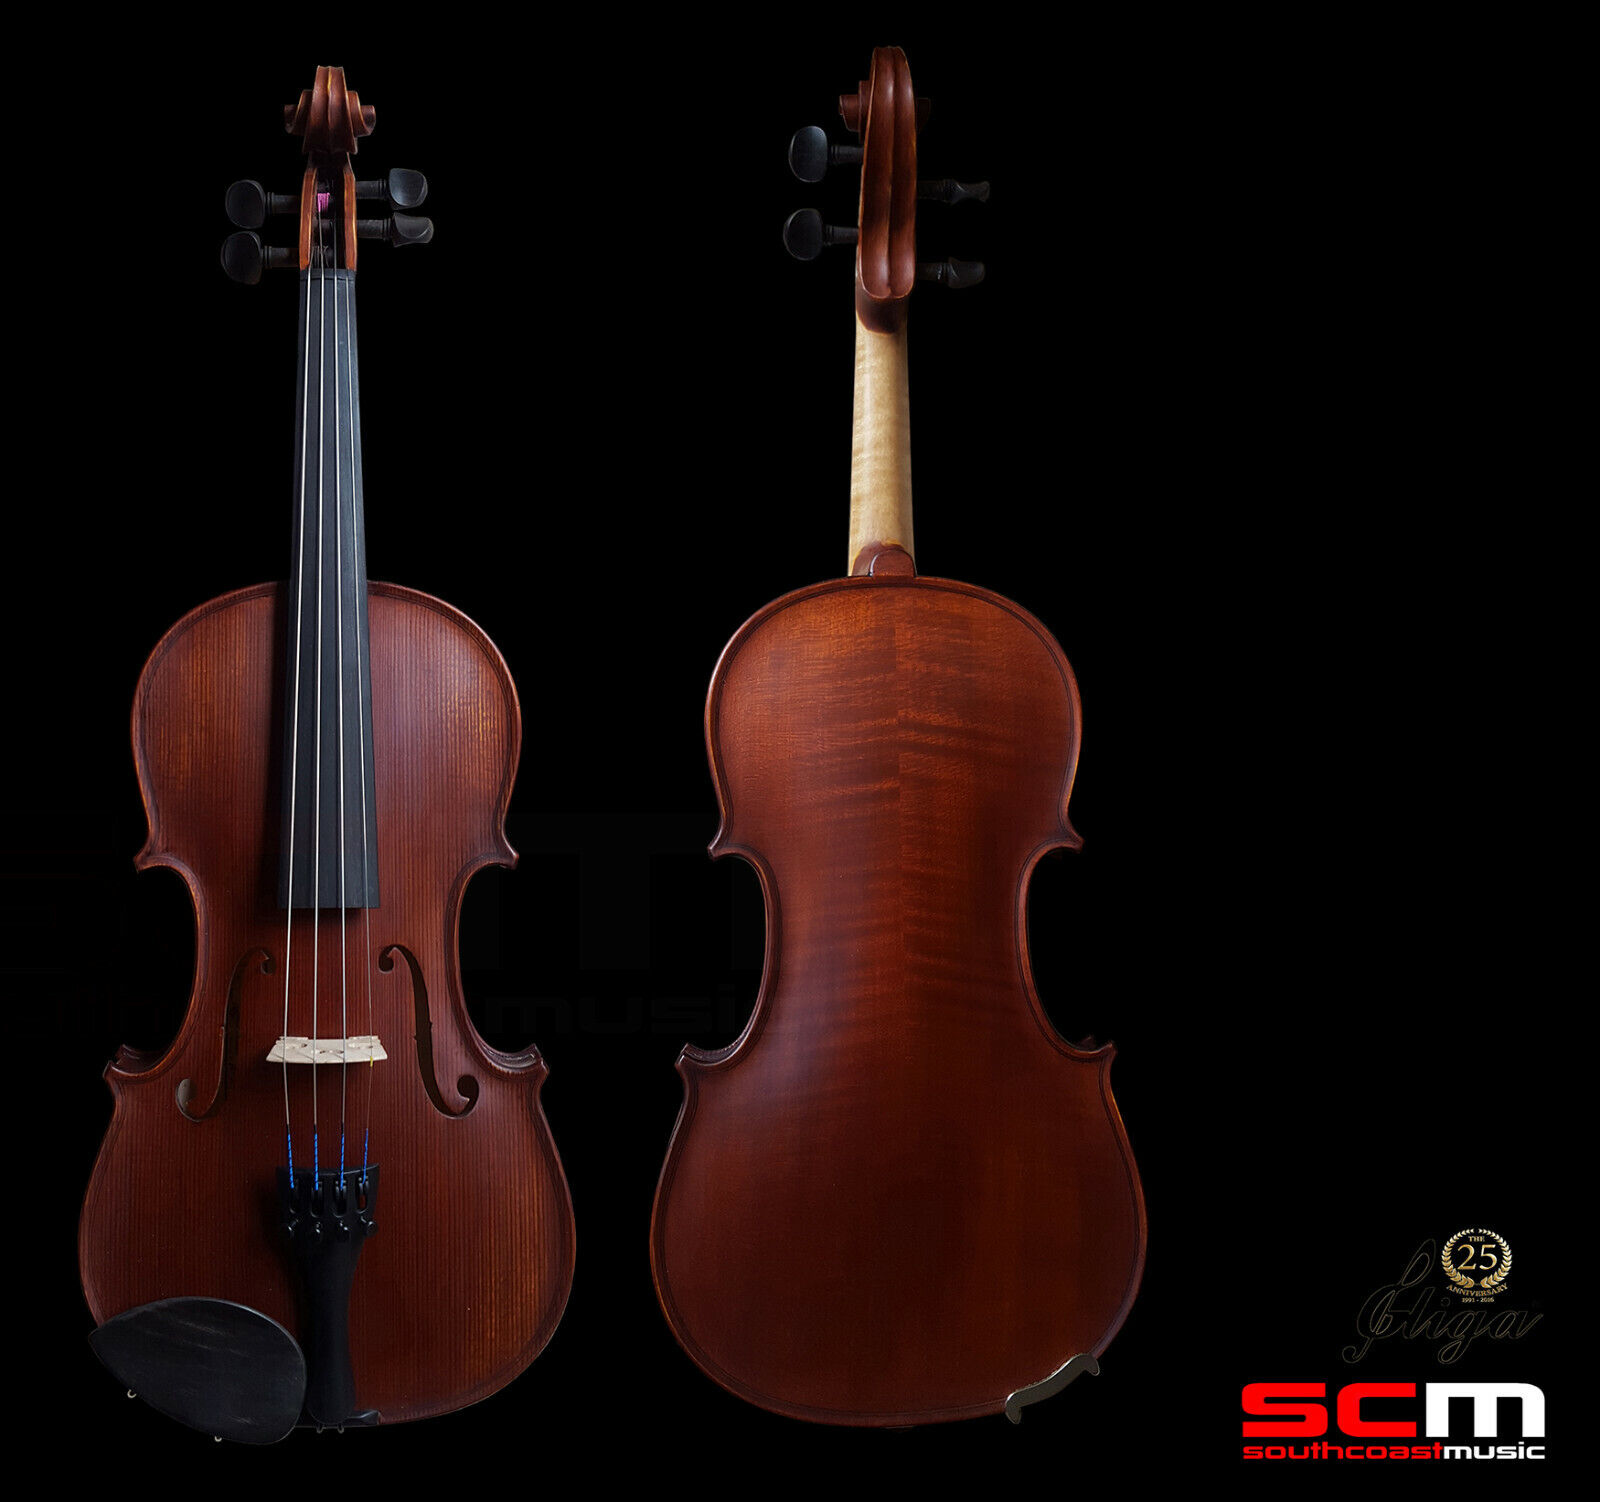 Gliga II 4 4 Violin Dark Antique Finish Professional Setup Hand Made in Romania